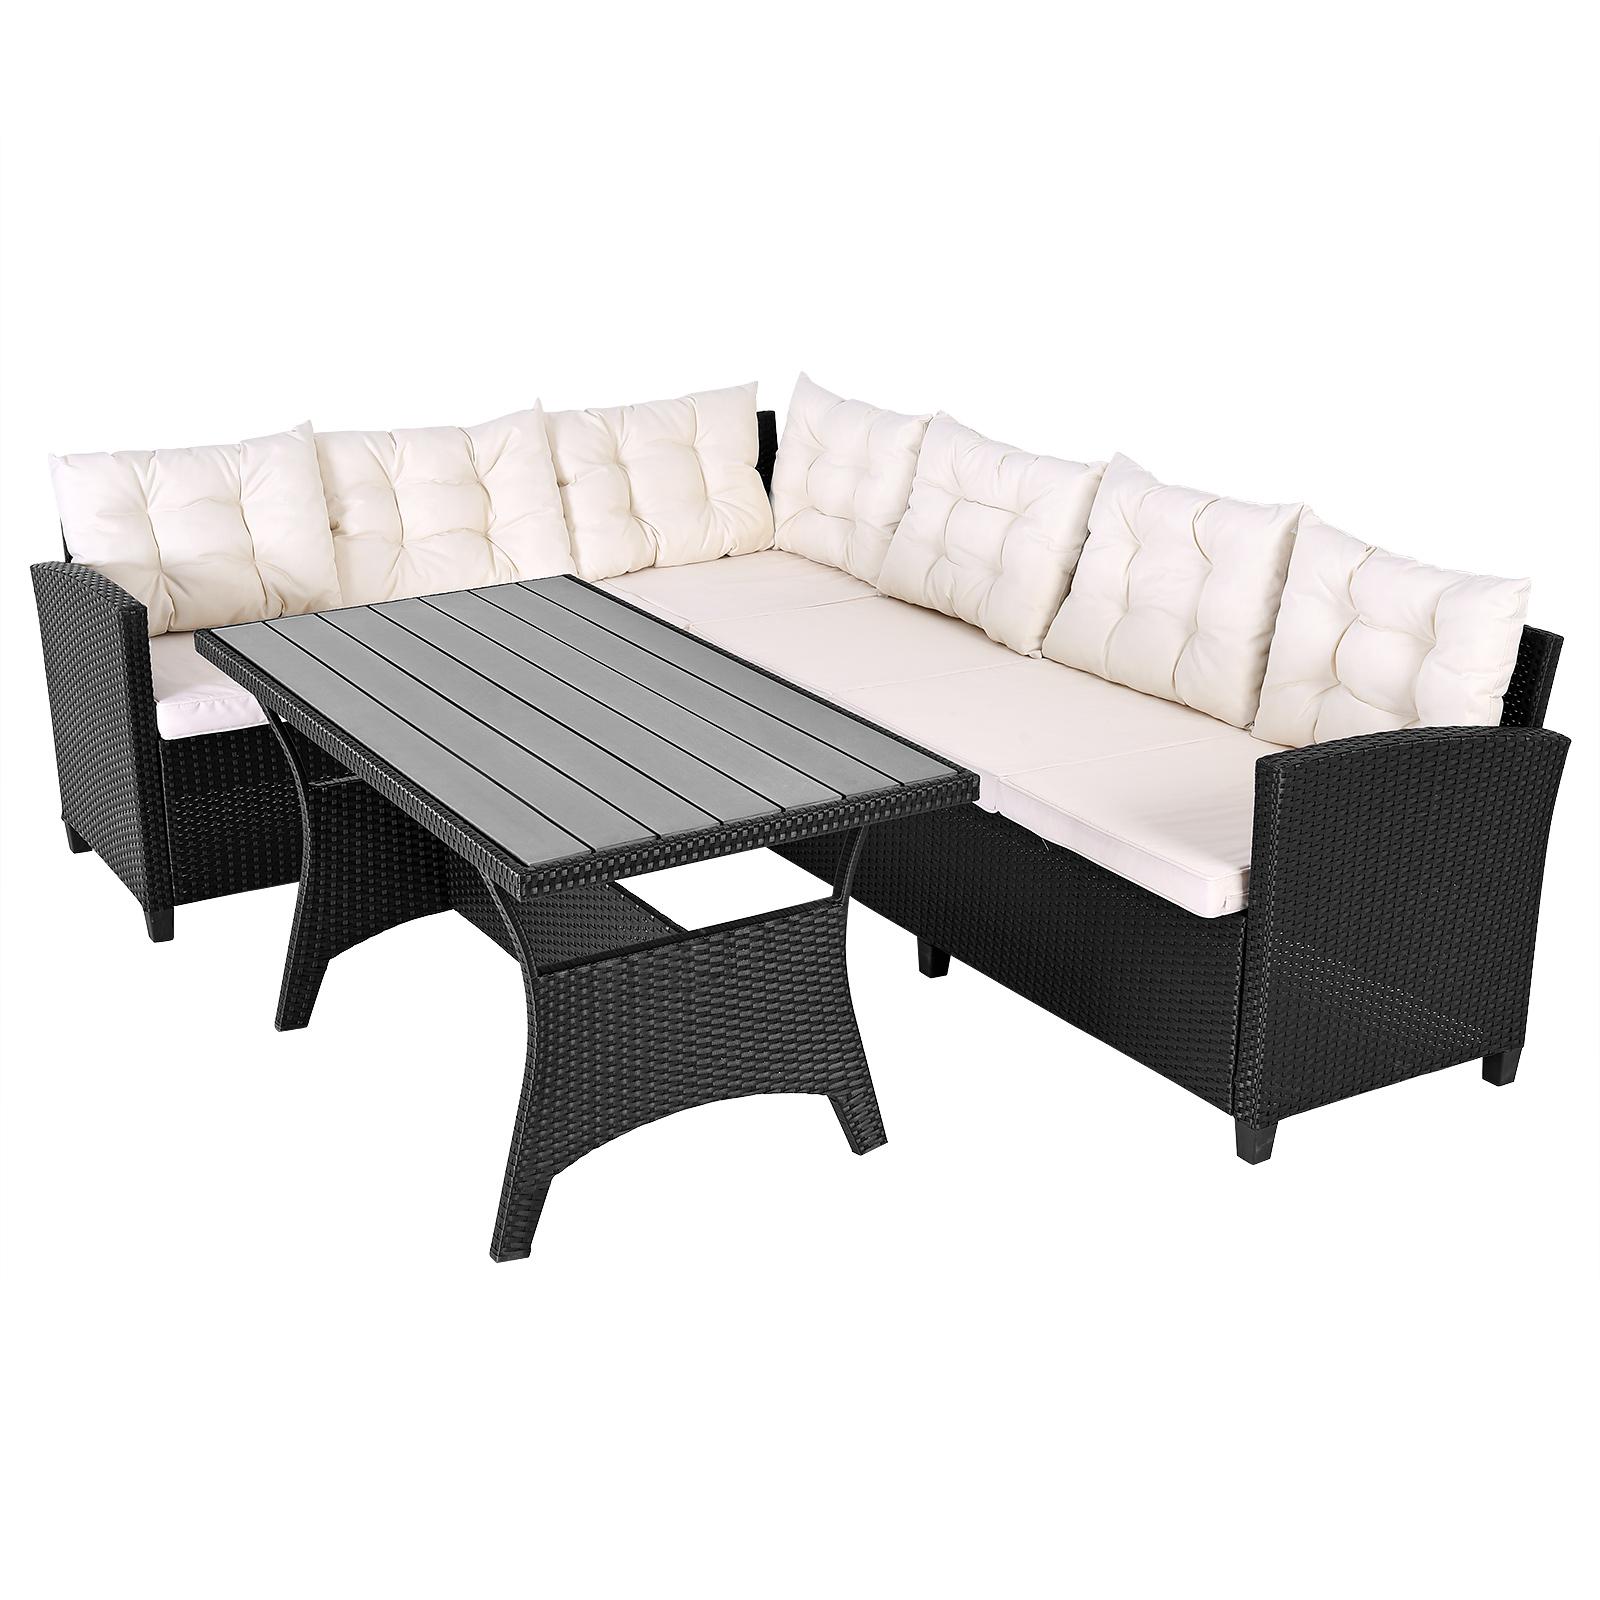 Deuba® Poly Rattan Ecklounge WPC Tisch Gartenmöbel Sitzgruppe Lounge ...